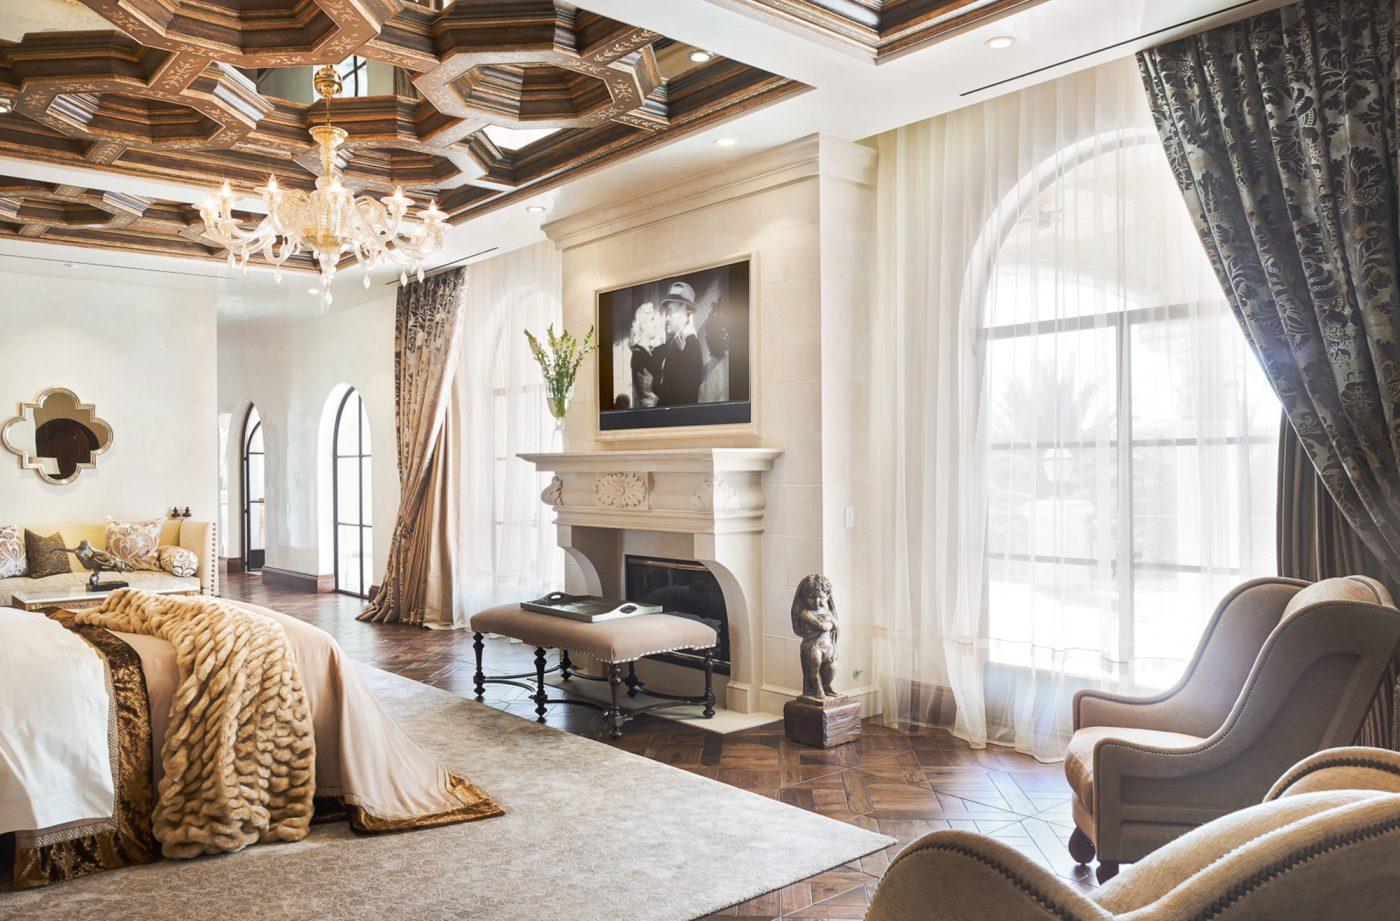 renaissance revival master suite   tara dudley interiors